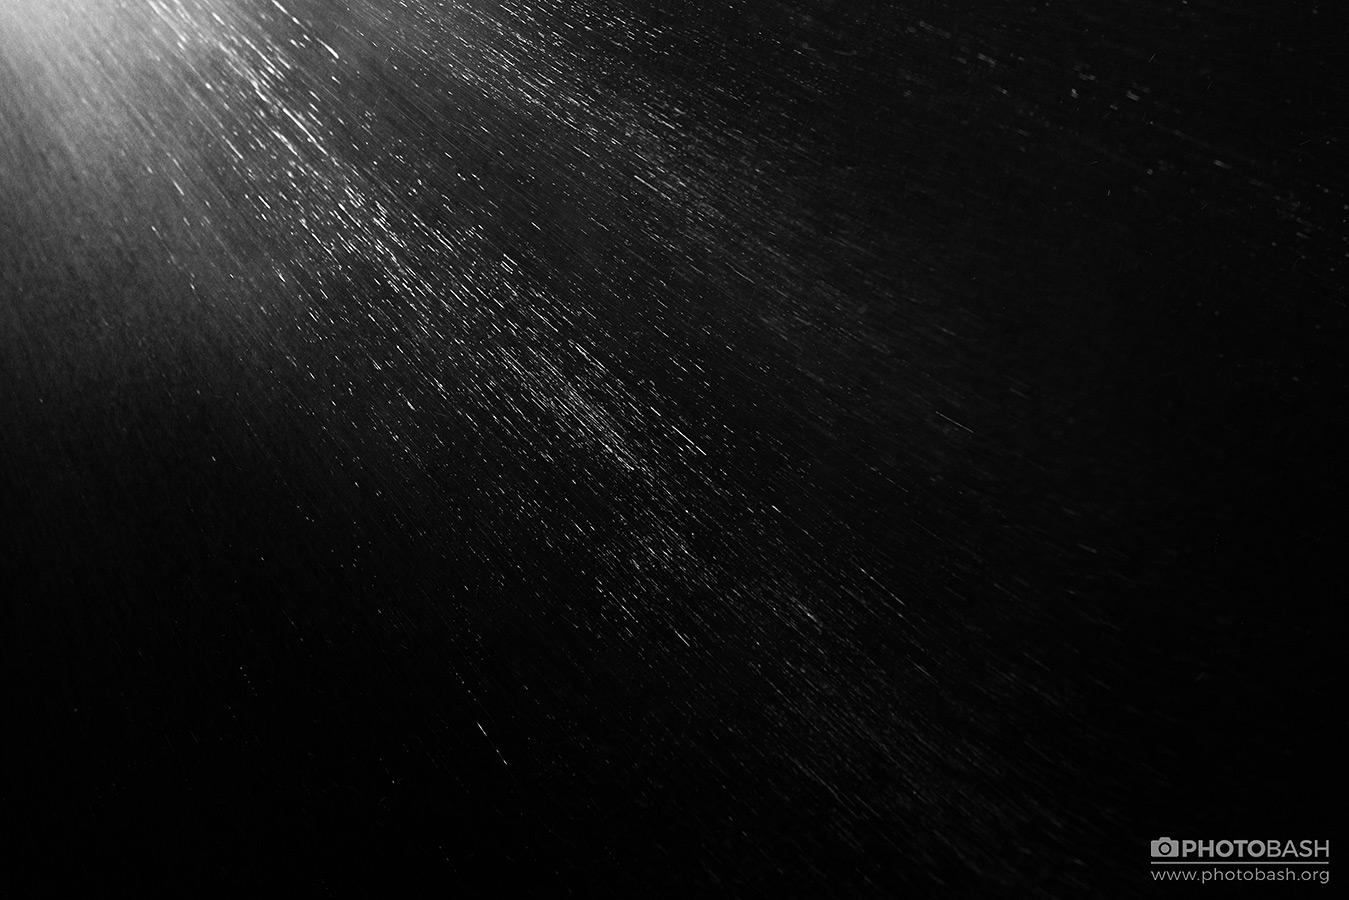 Rain-Particles-Water-Droplets.jpg